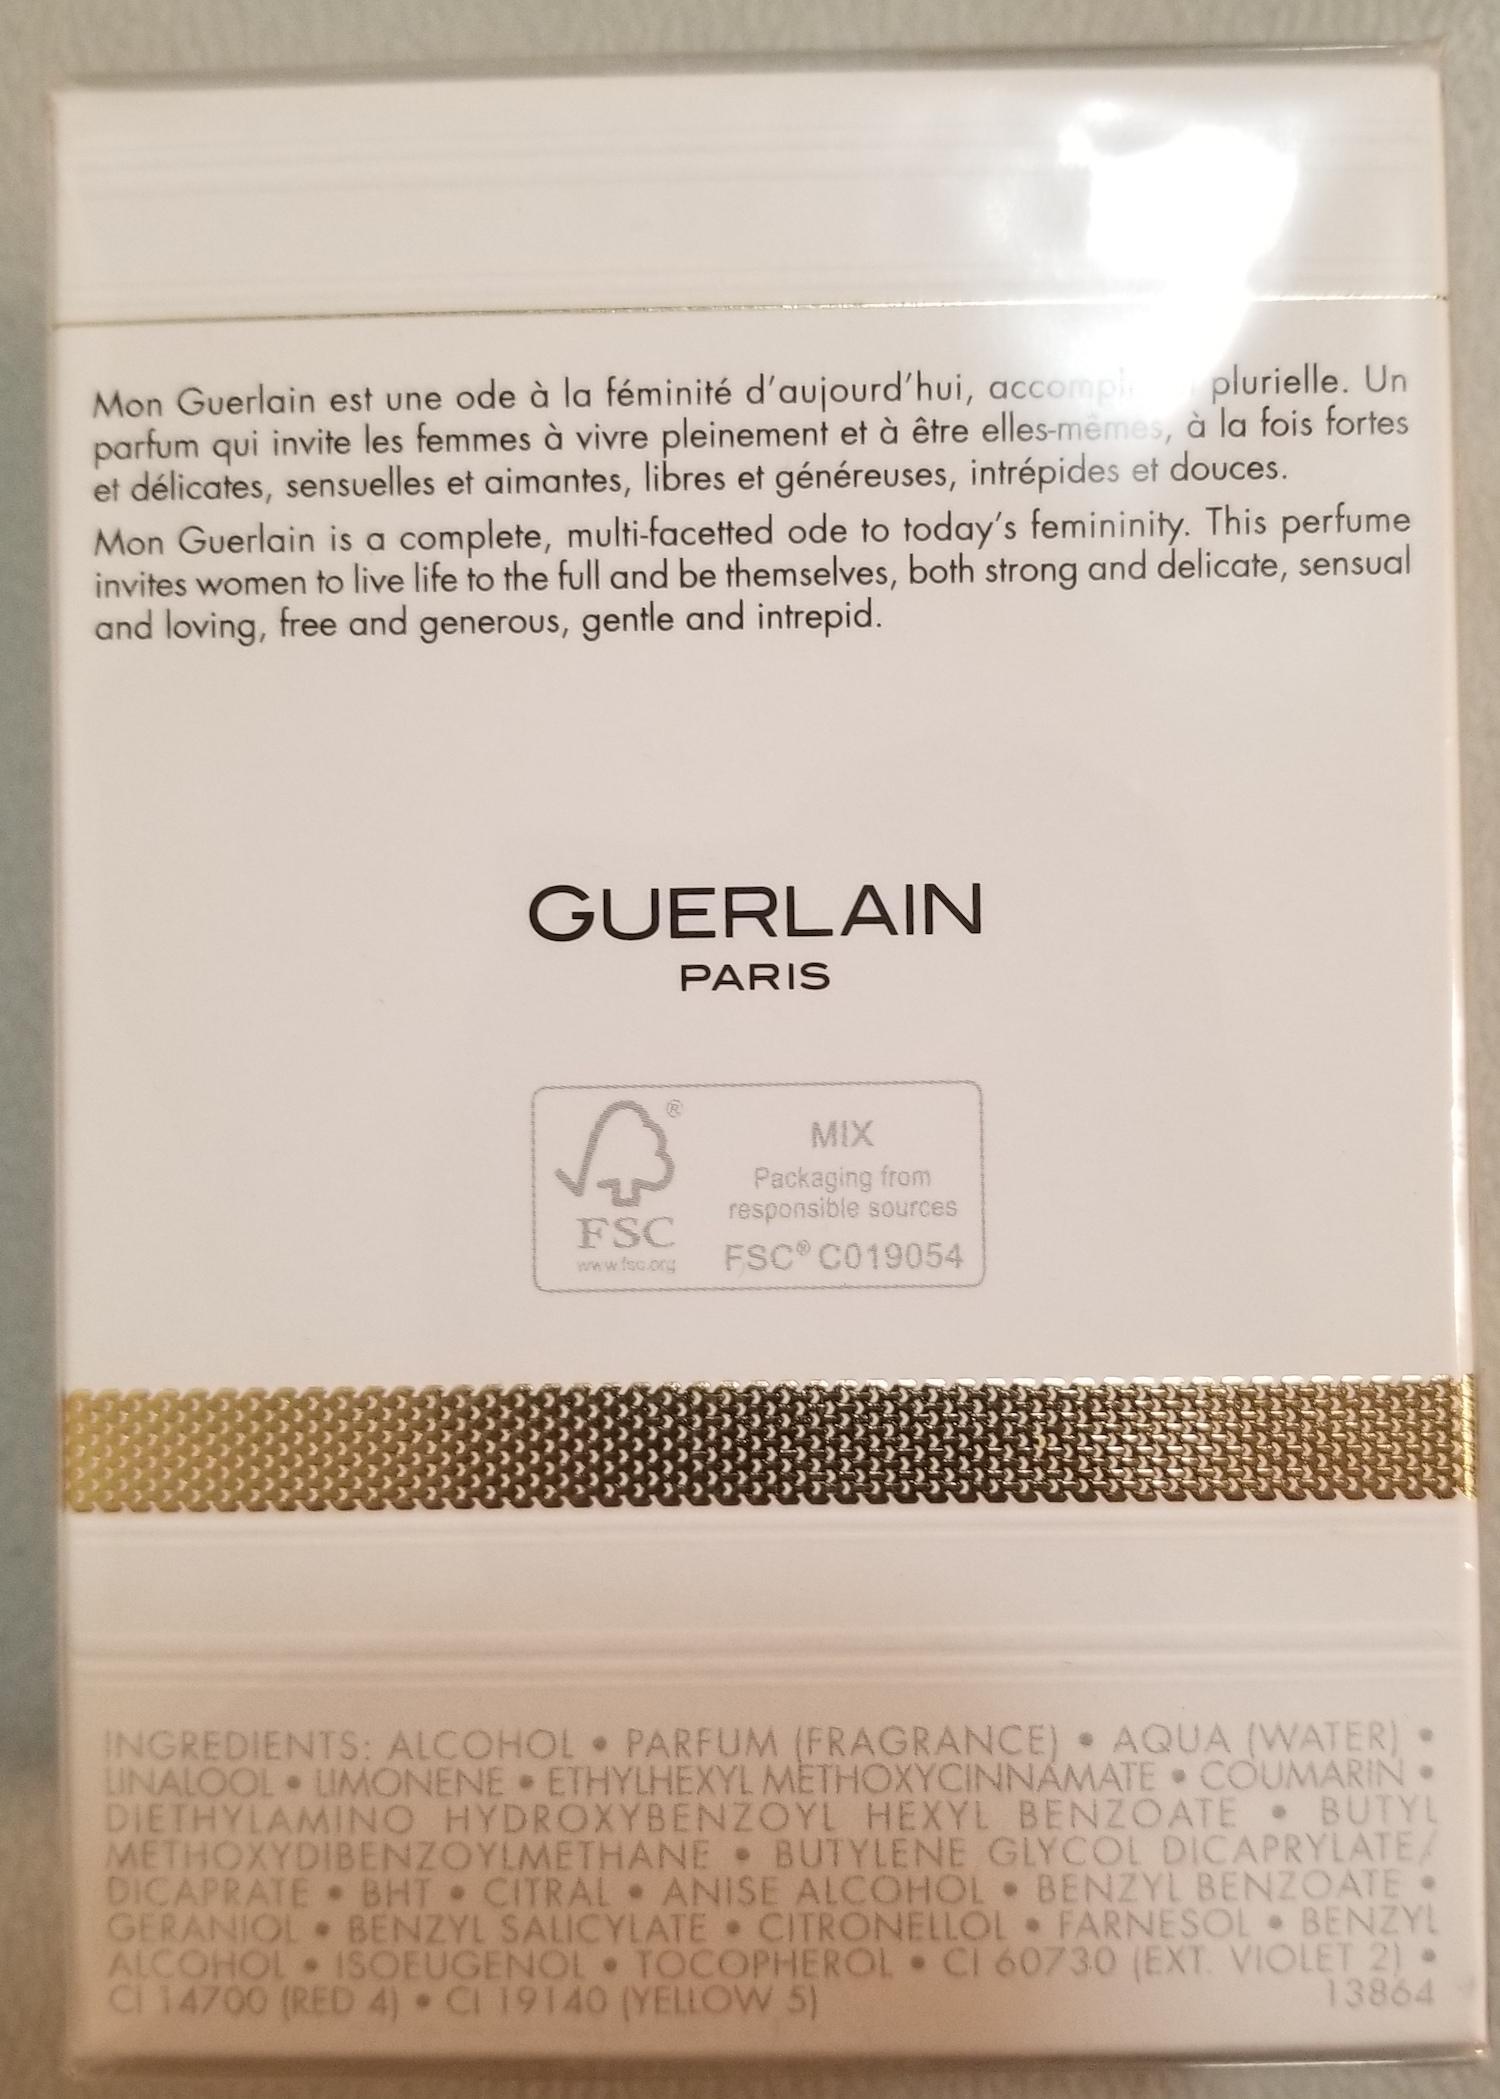 mon-guerlain-3.3-3.4-oz-edp-spray-womens-perfume-100-ml-nib-sealed